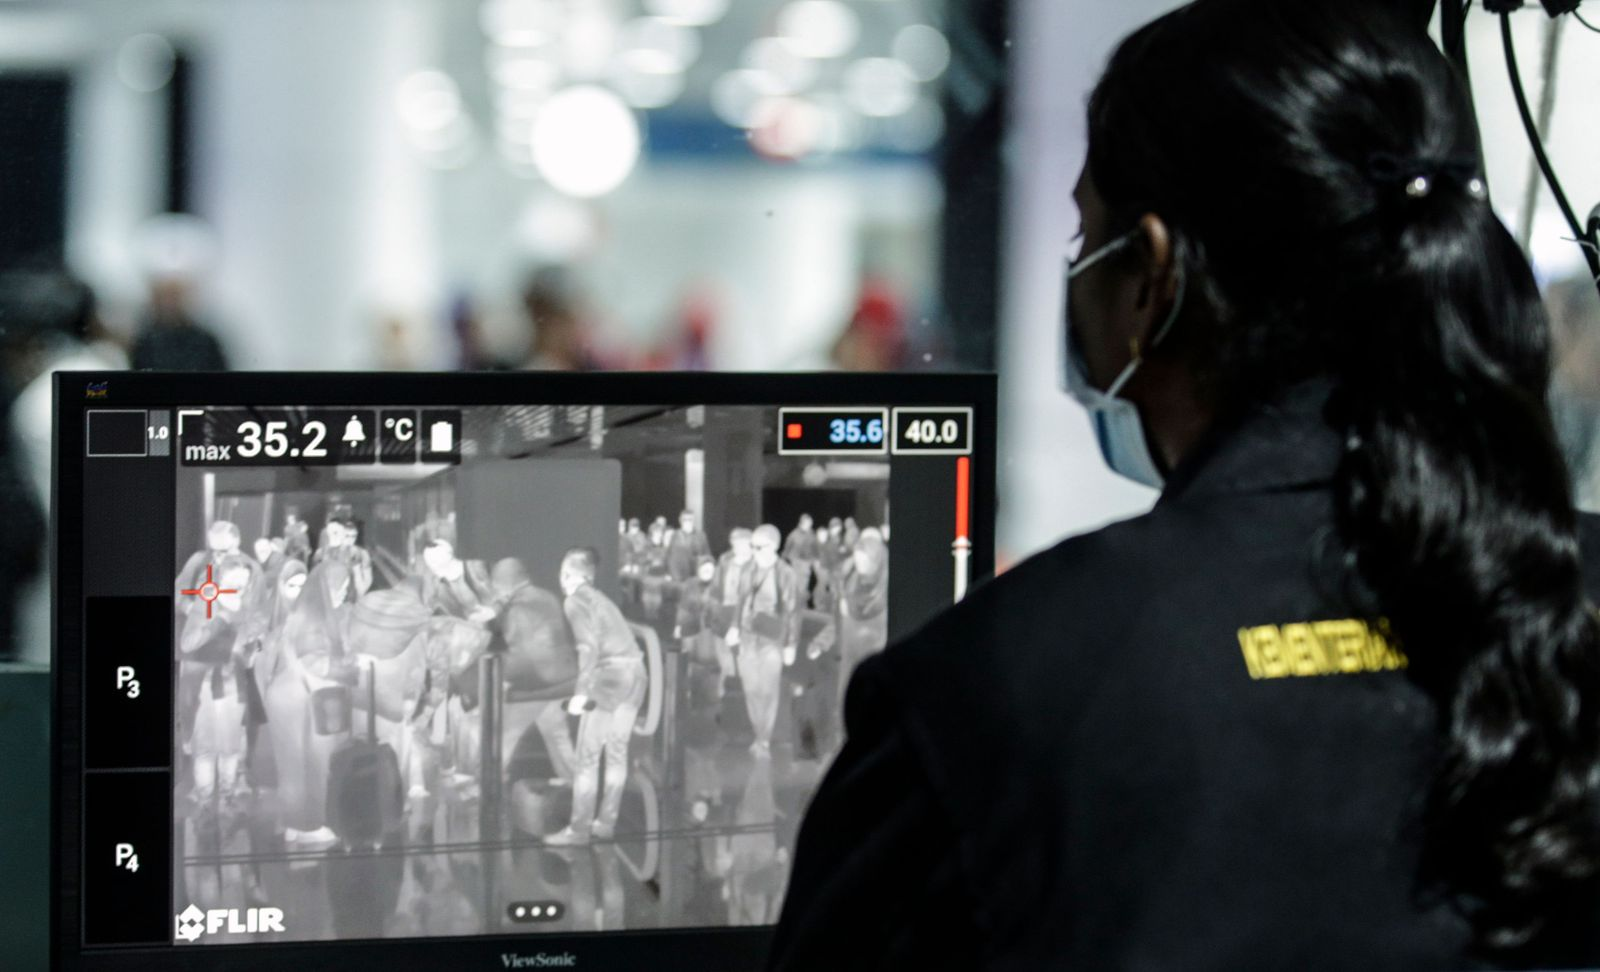 Airports boost thermal screening as coronavirus death toll rises, Sepang, Malaysia - 21 Jan 2020